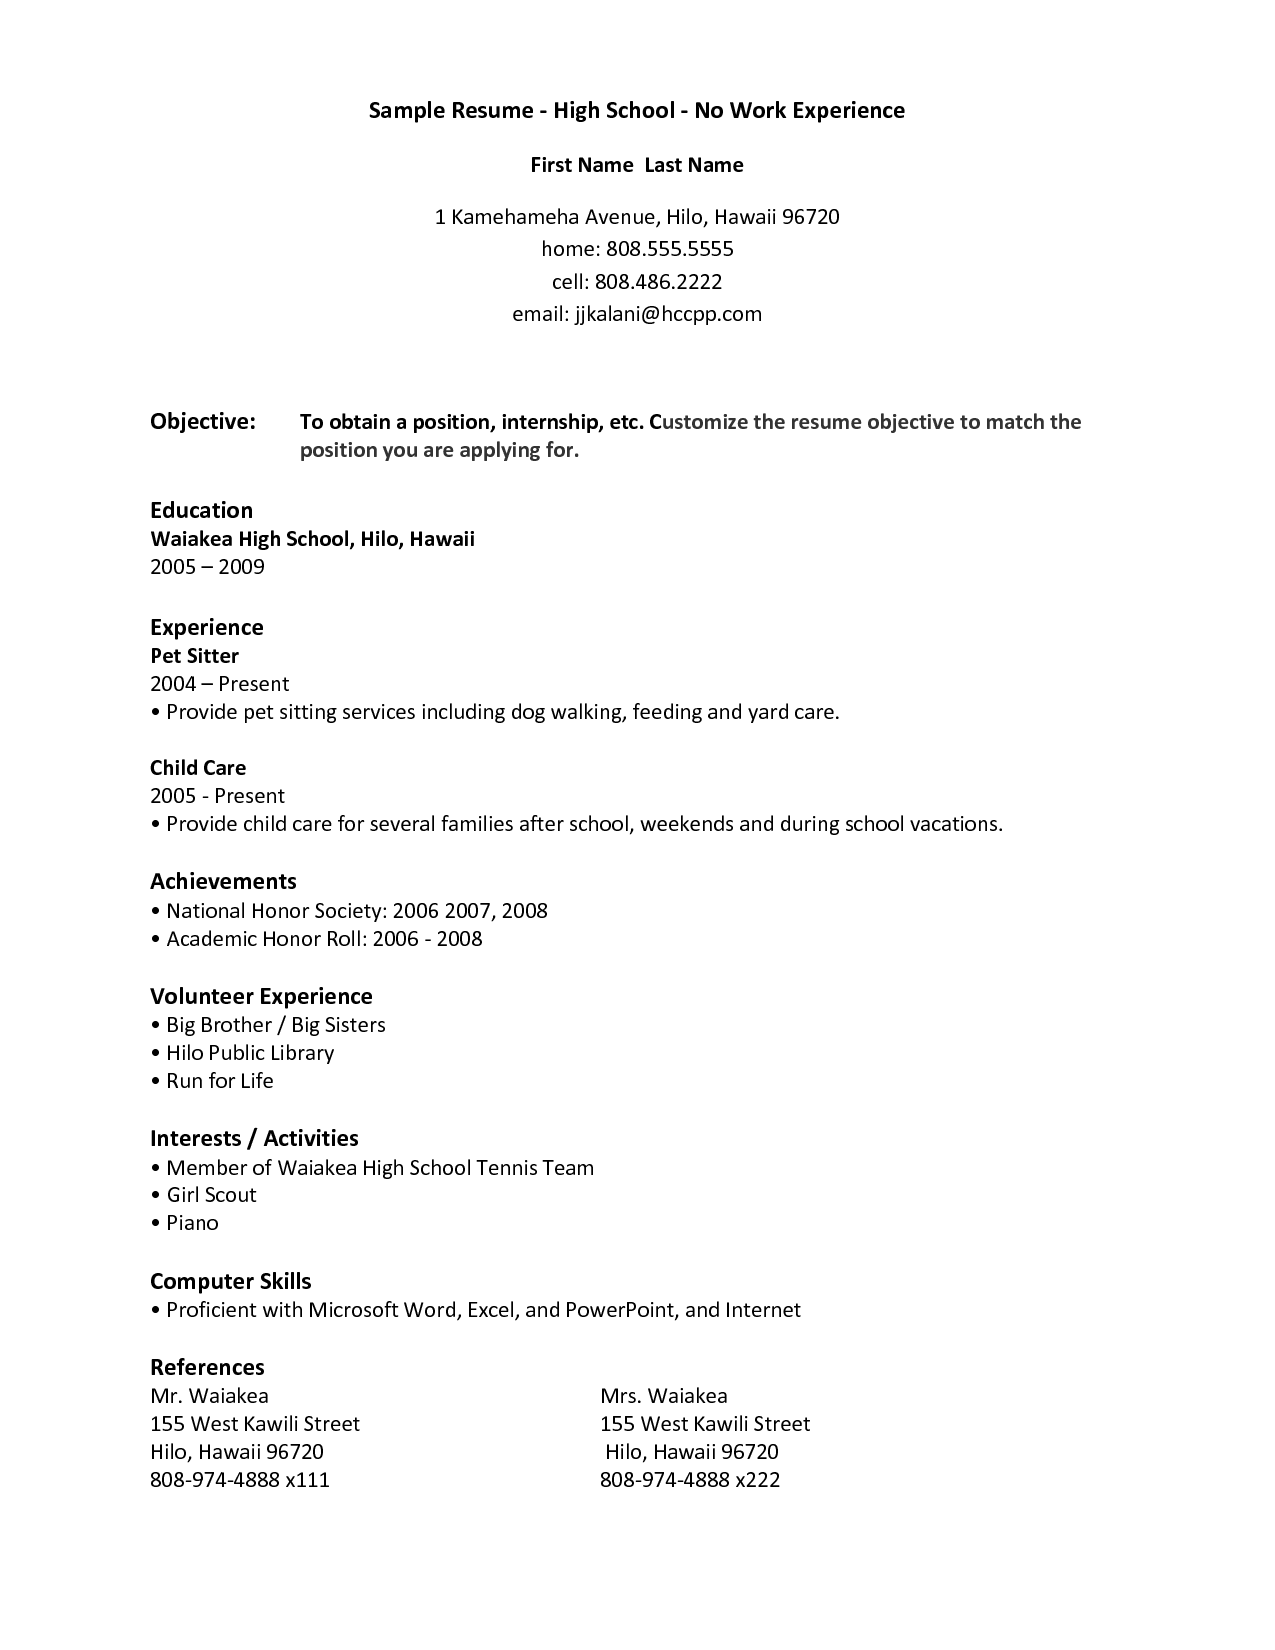 High School Student Resume Example Resume Template Builder 7ypvaryf